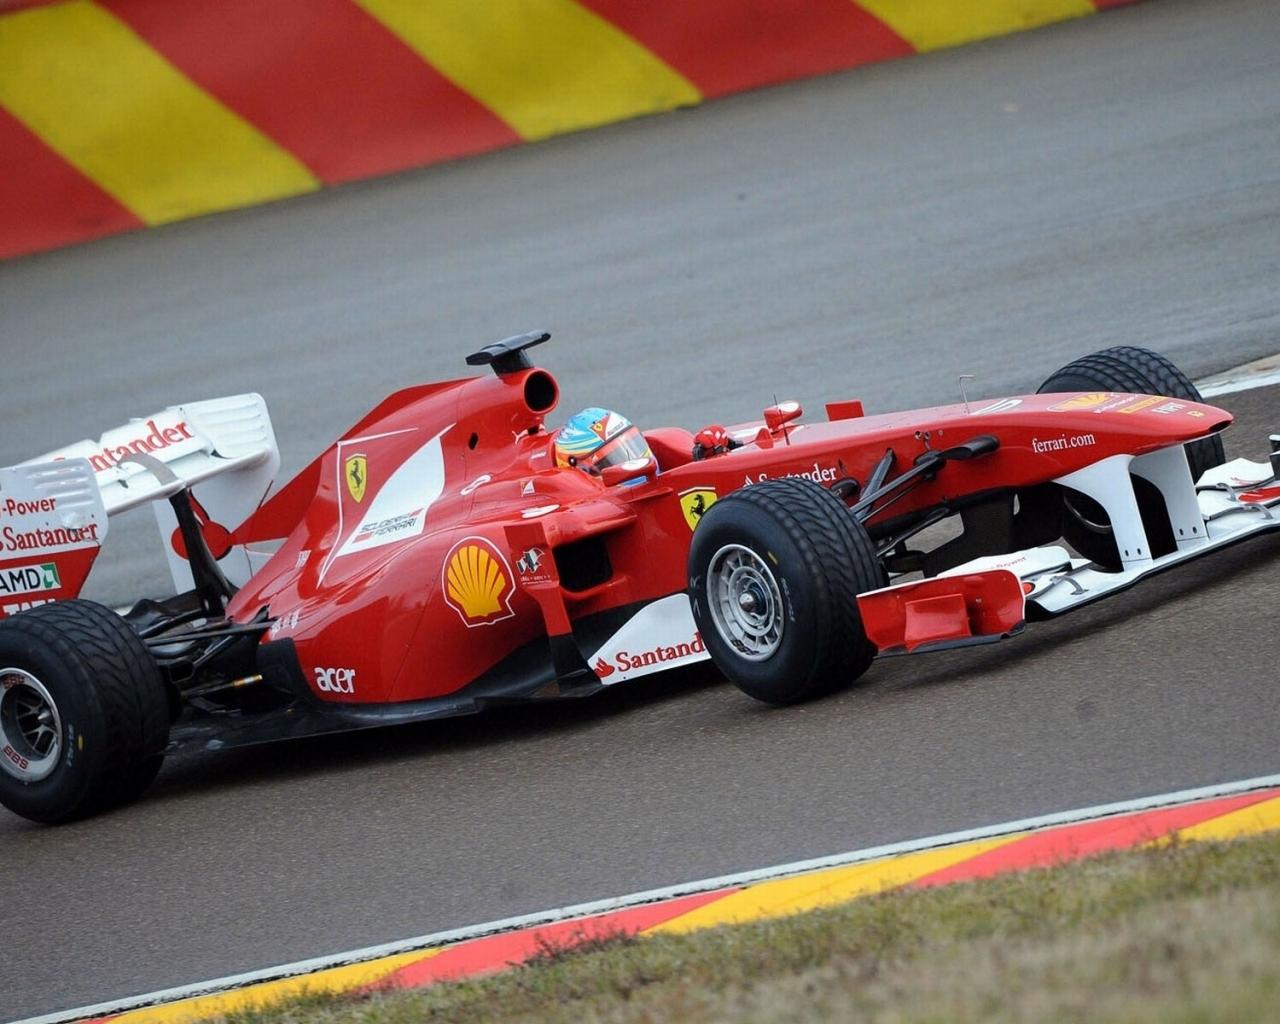 Ferrari en formula 1 - 1280x1024